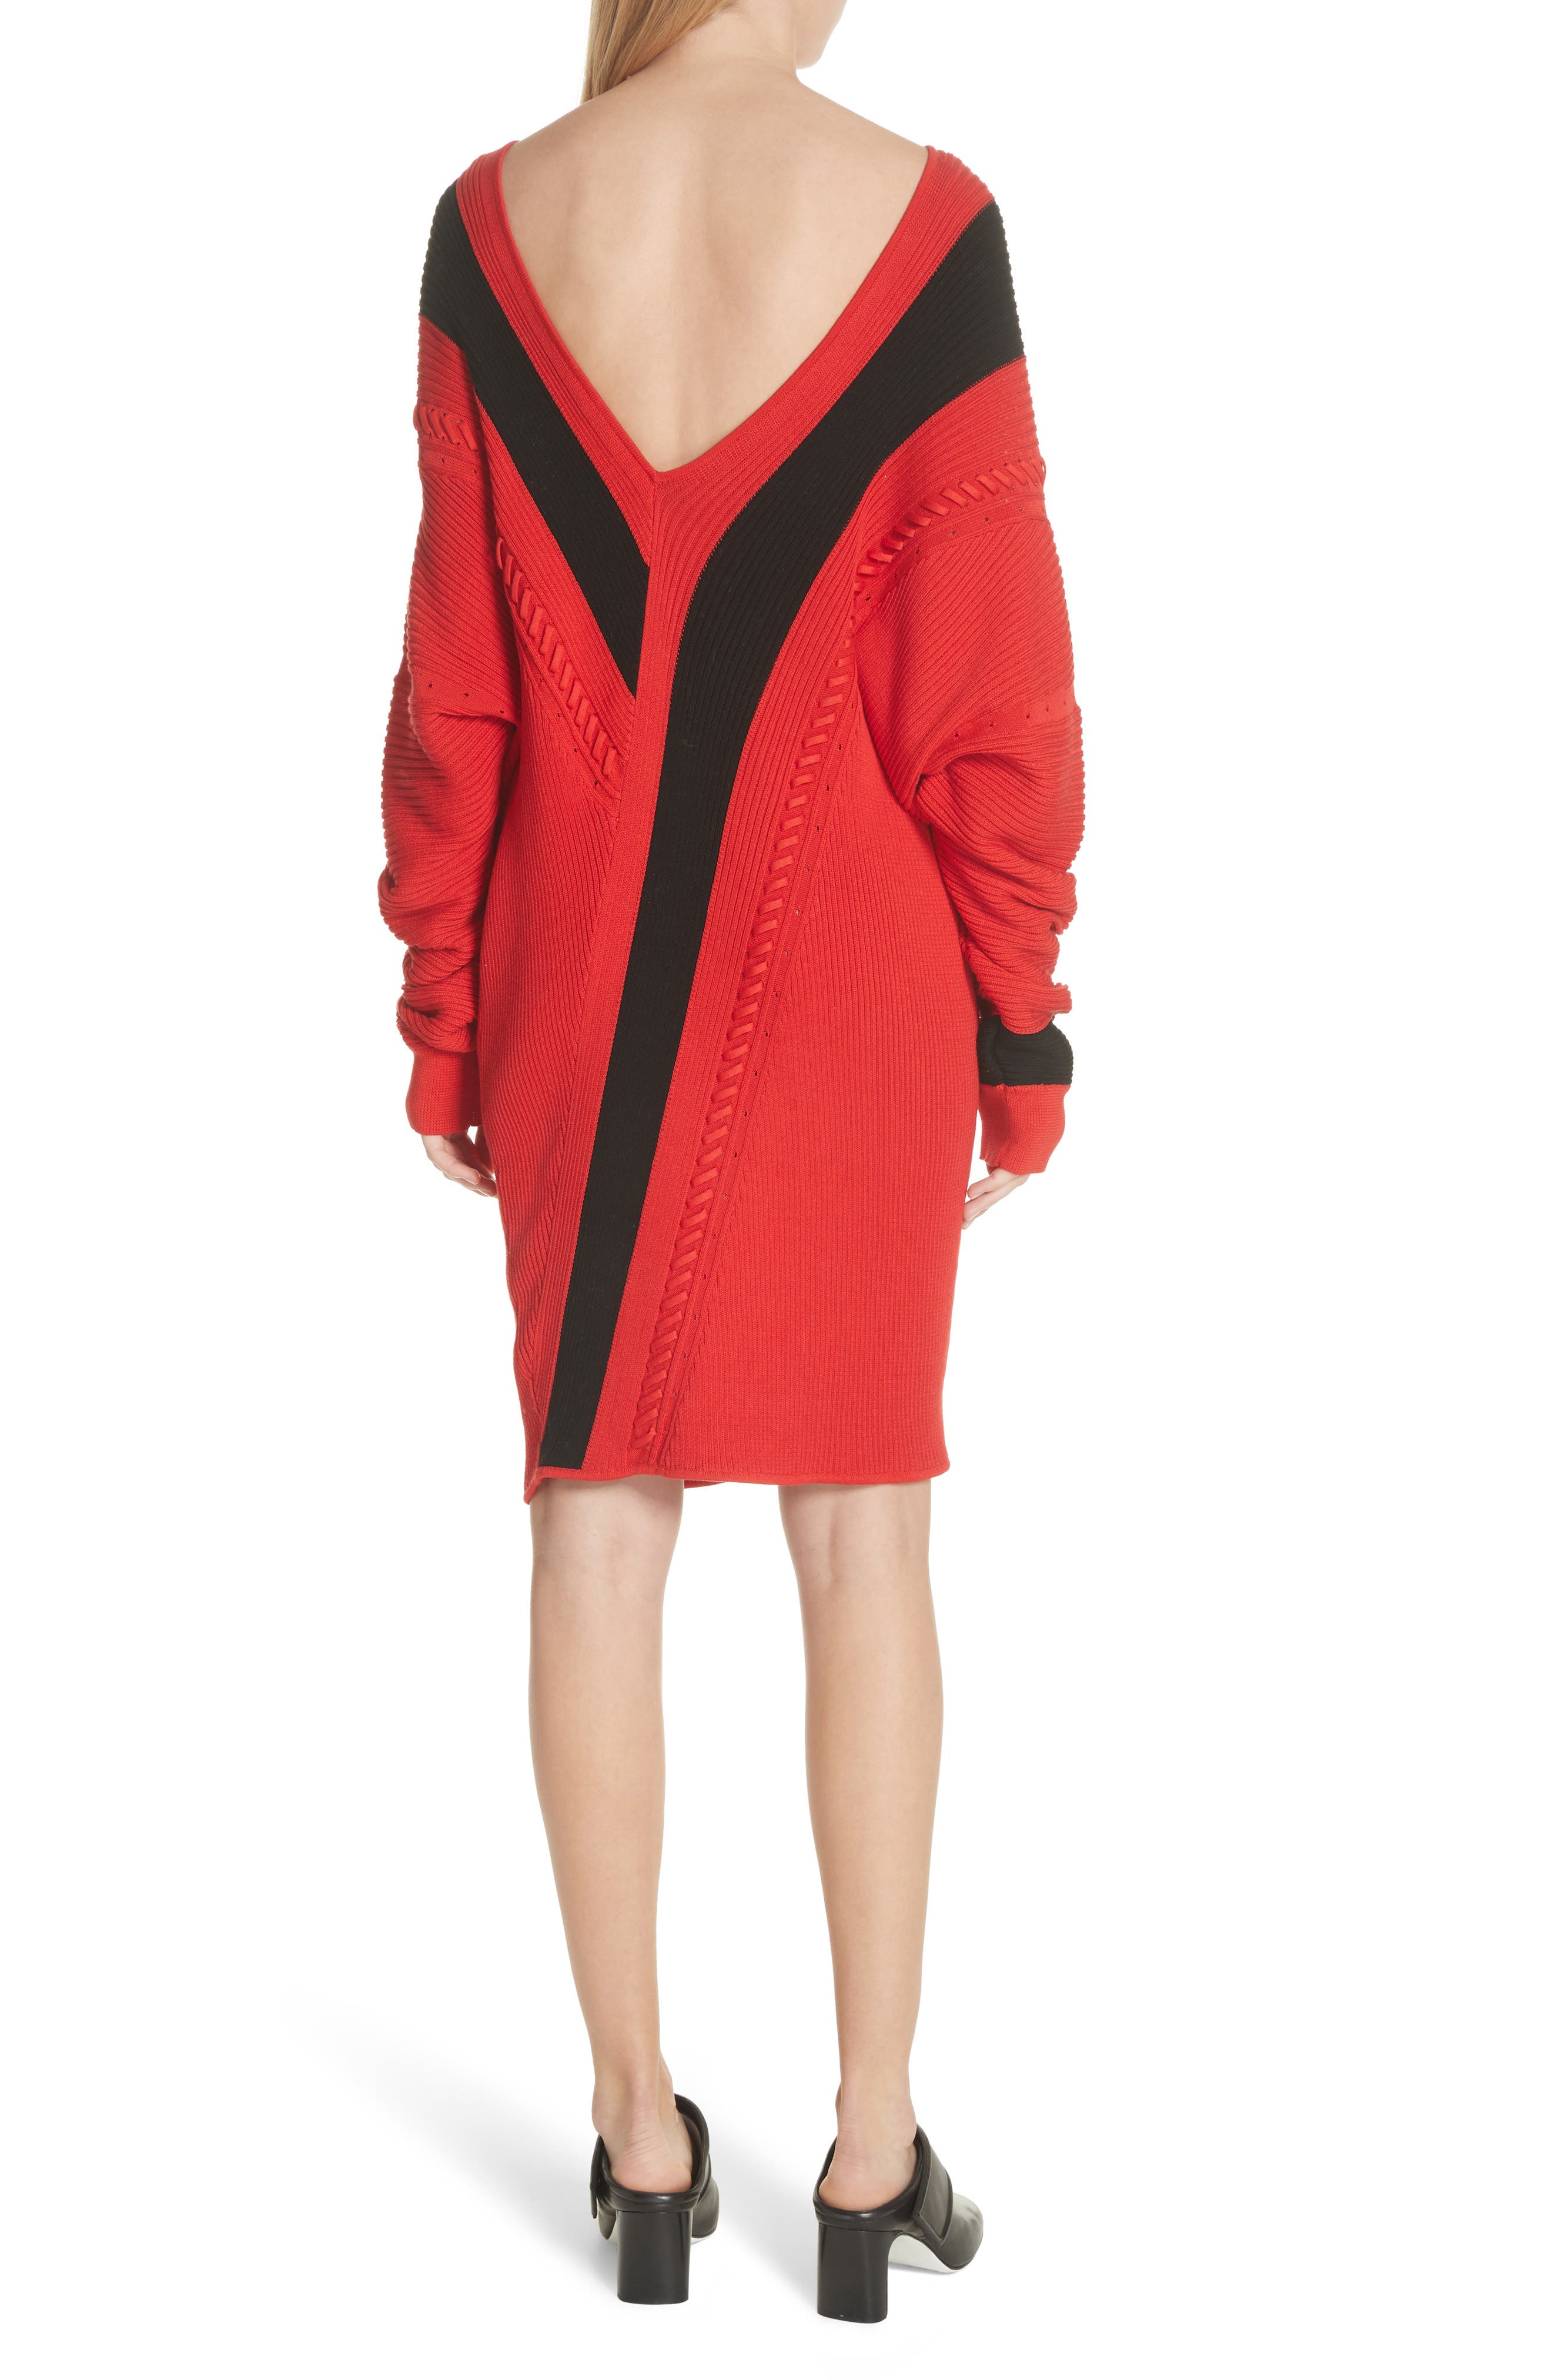 Cricket Reversible Sweater Dress,                             Alternate thumbnail 2, color,                             600